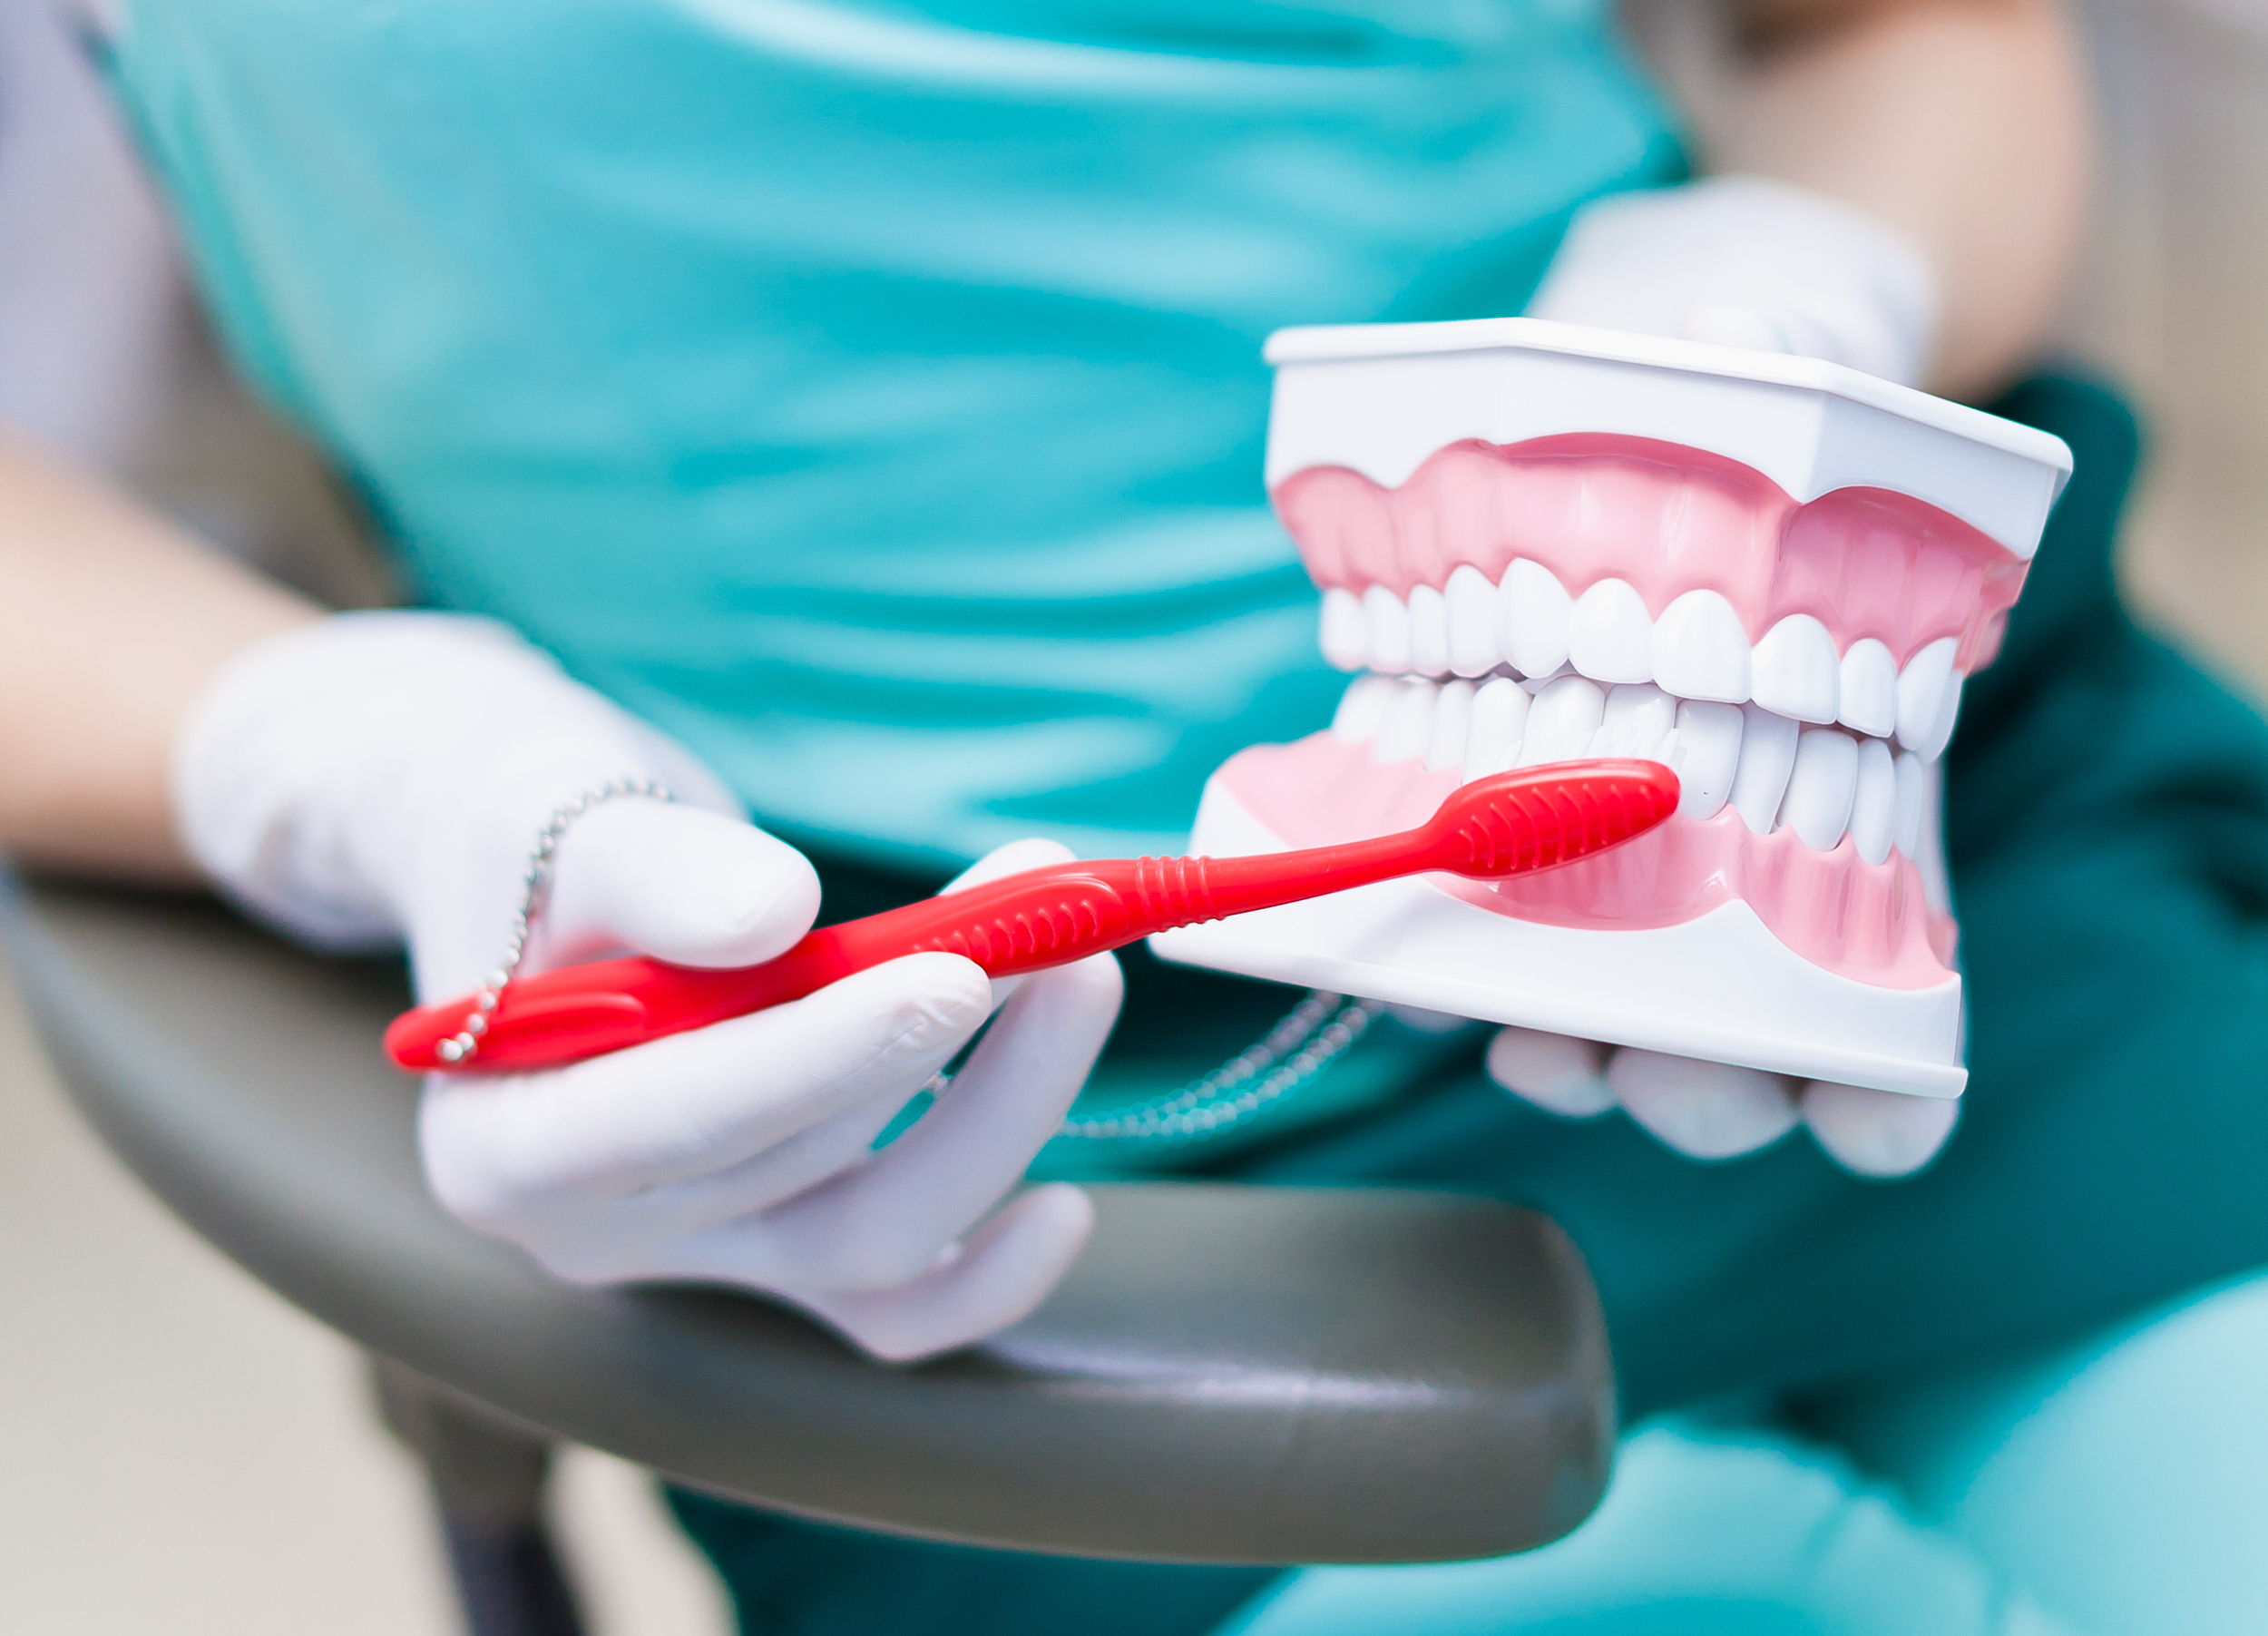 dental products10.jpg